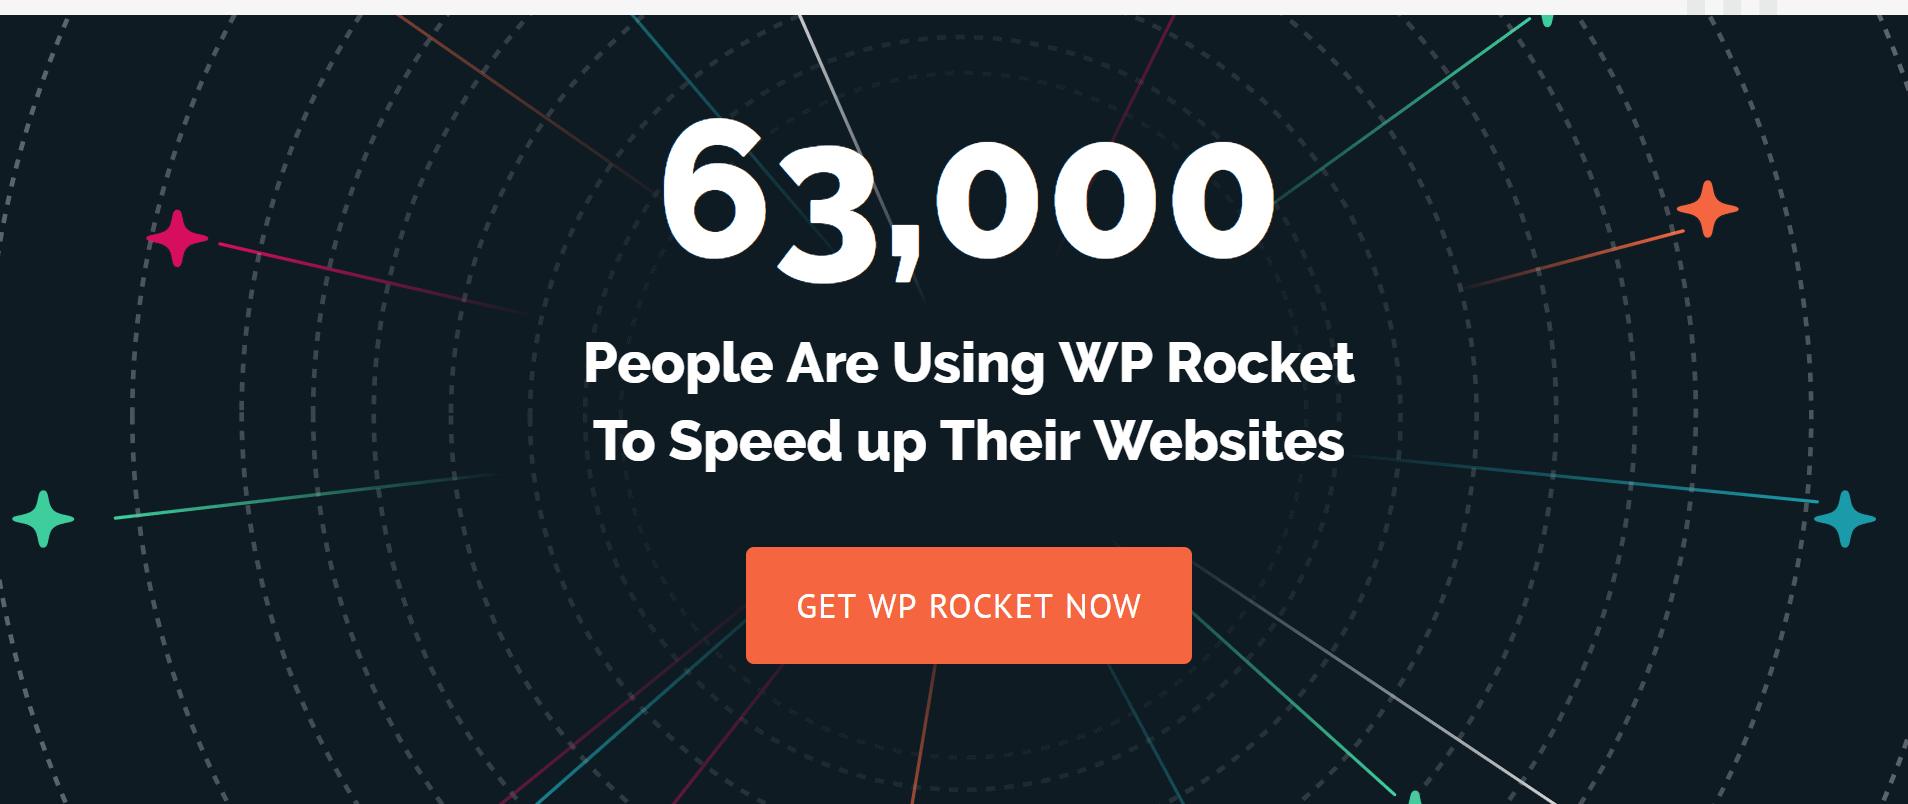 wp rocket discount promo coupons